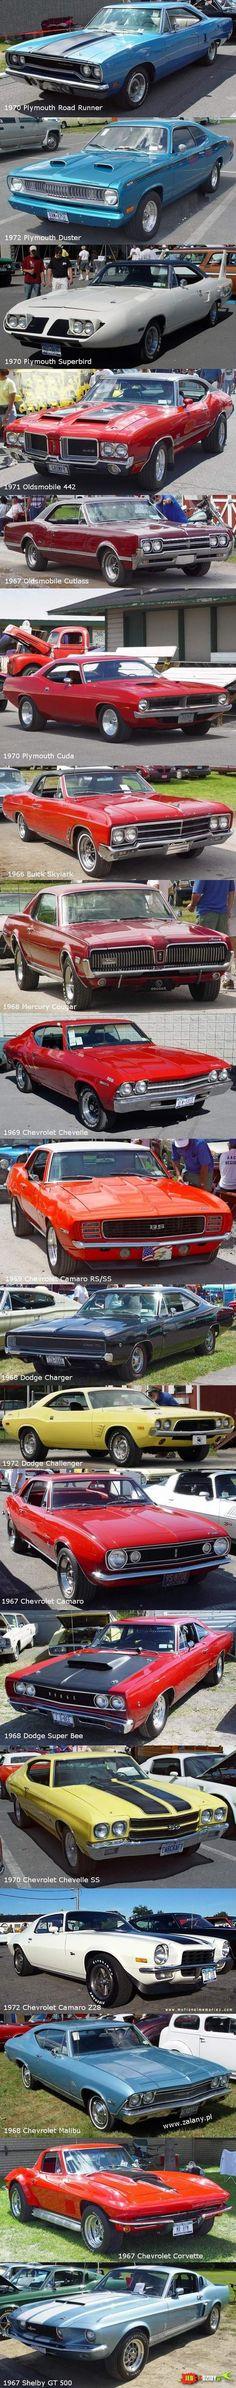 Back in the Day!  1966 Buick Skylark (Convertible)  1967 Oldsmobile Cutlass American Classics 1967 - 1972